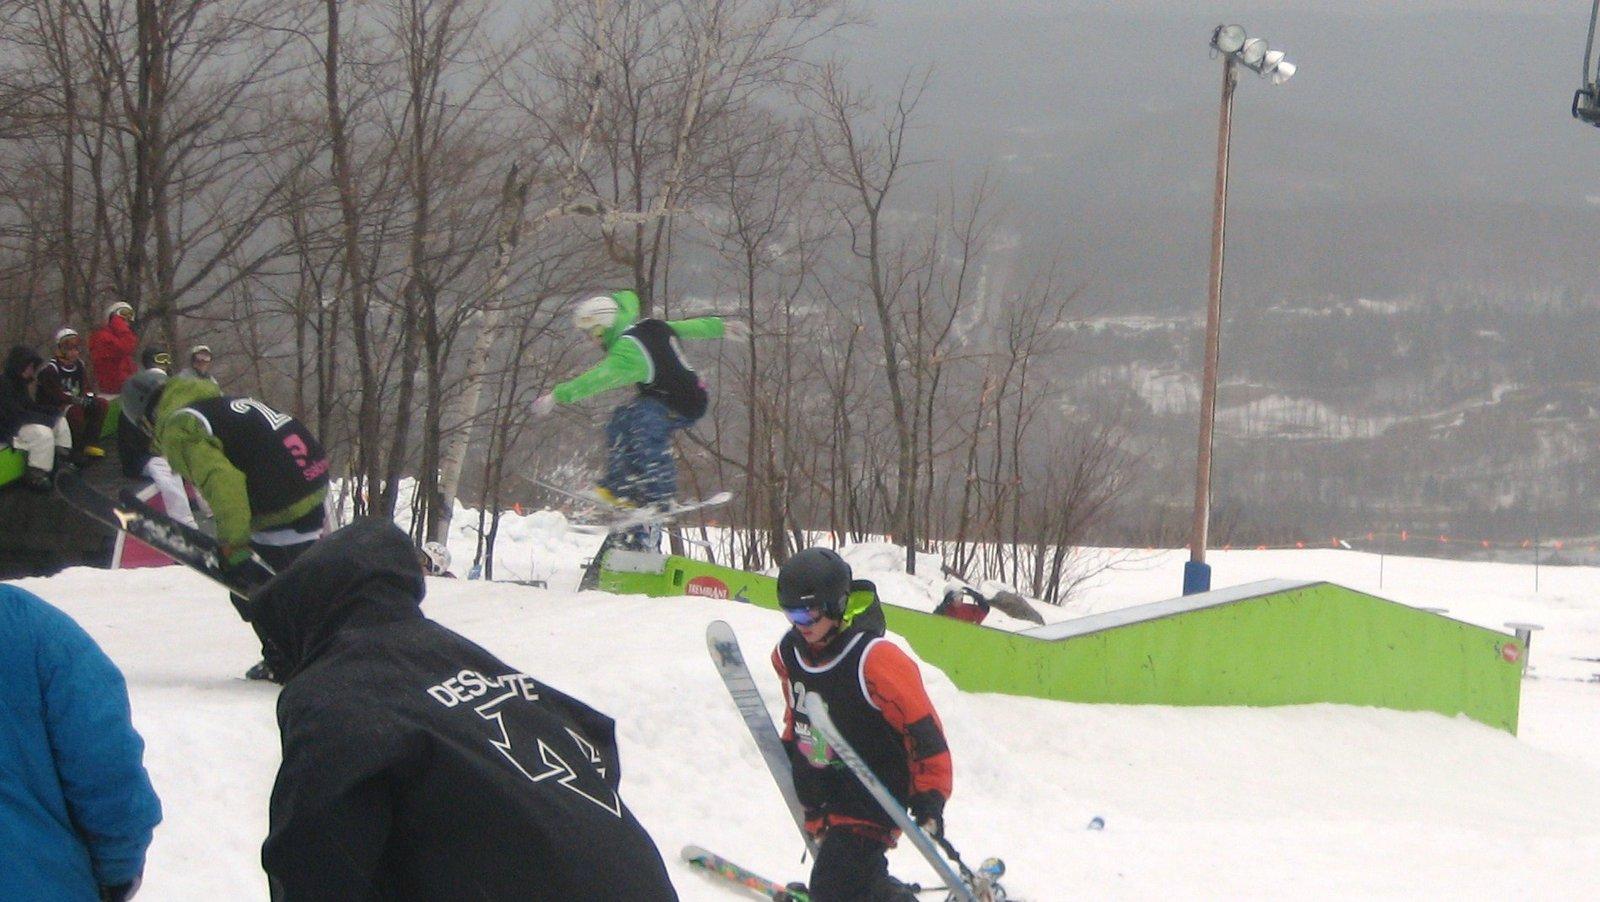 Ski free - 2 of 2